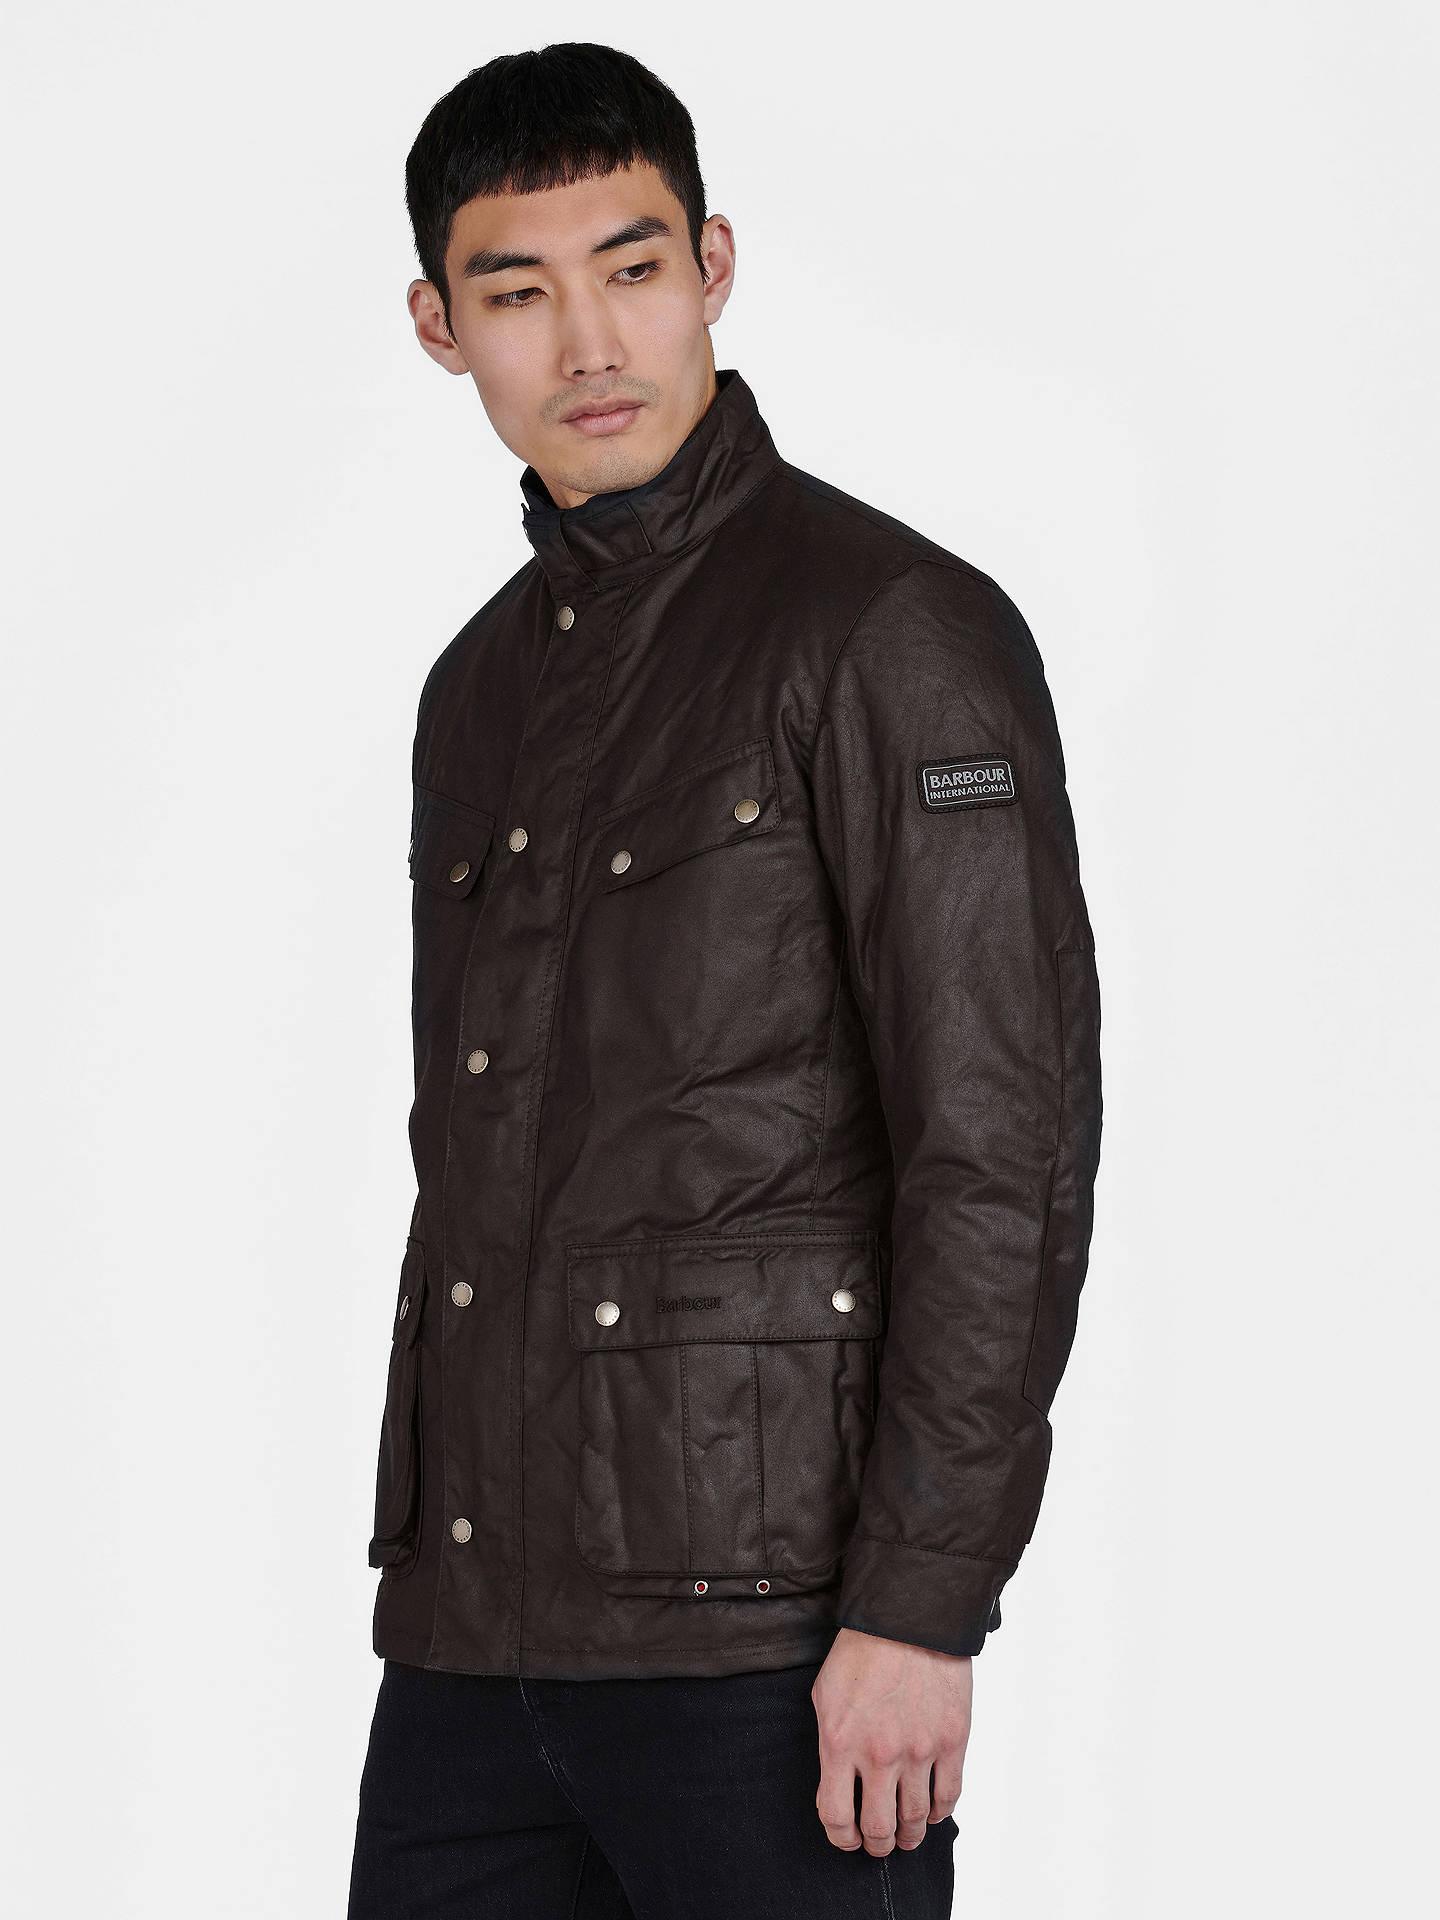 6d4bcc456ed9 Barbour International Duke Wax Jacket at John Lewis   Partners